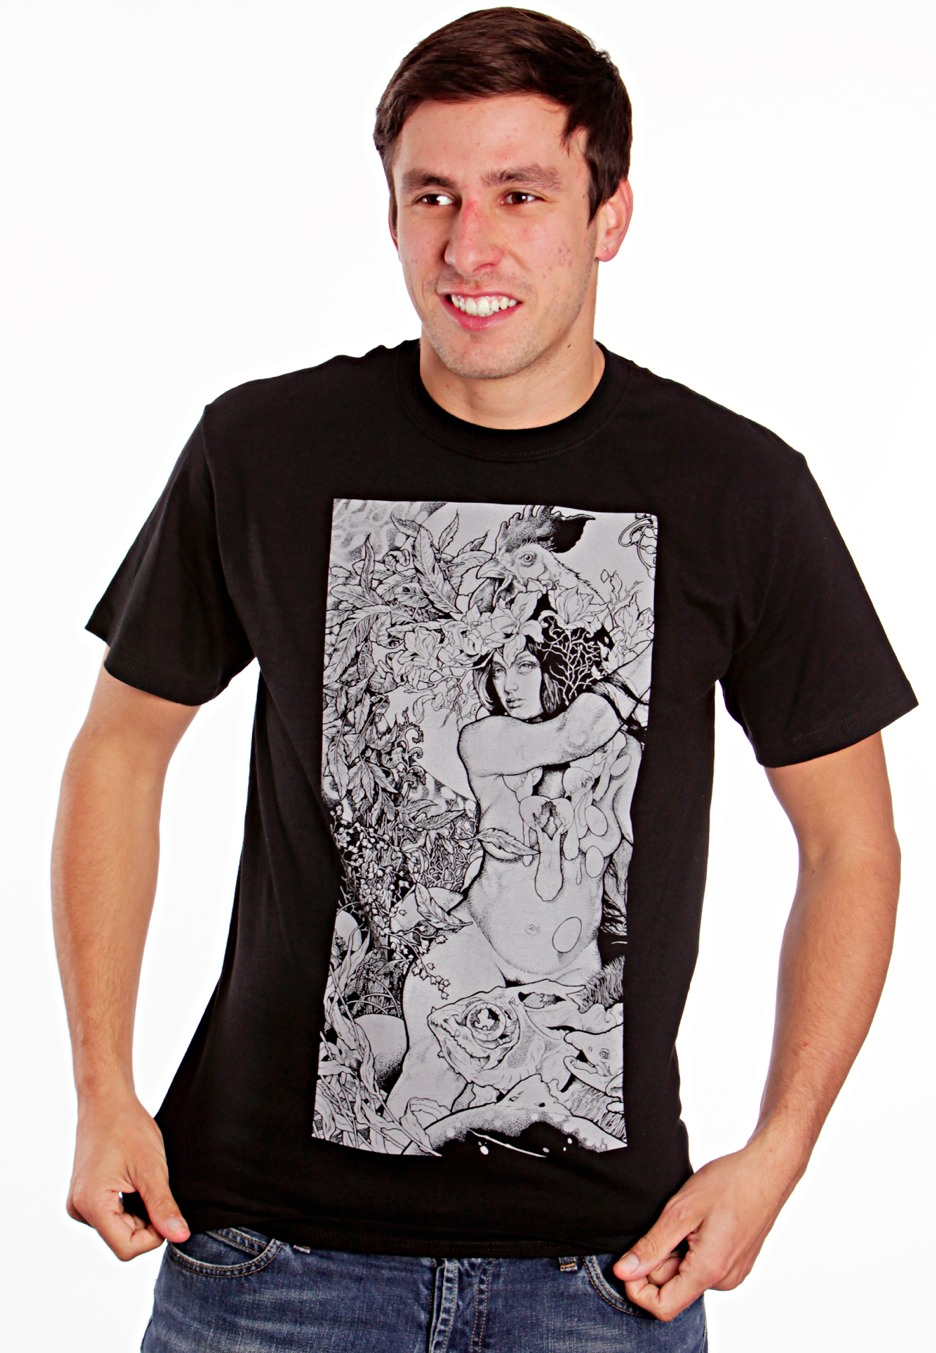 Baroness - Blue Record Silver - T-Shirt - Impericon.com ...